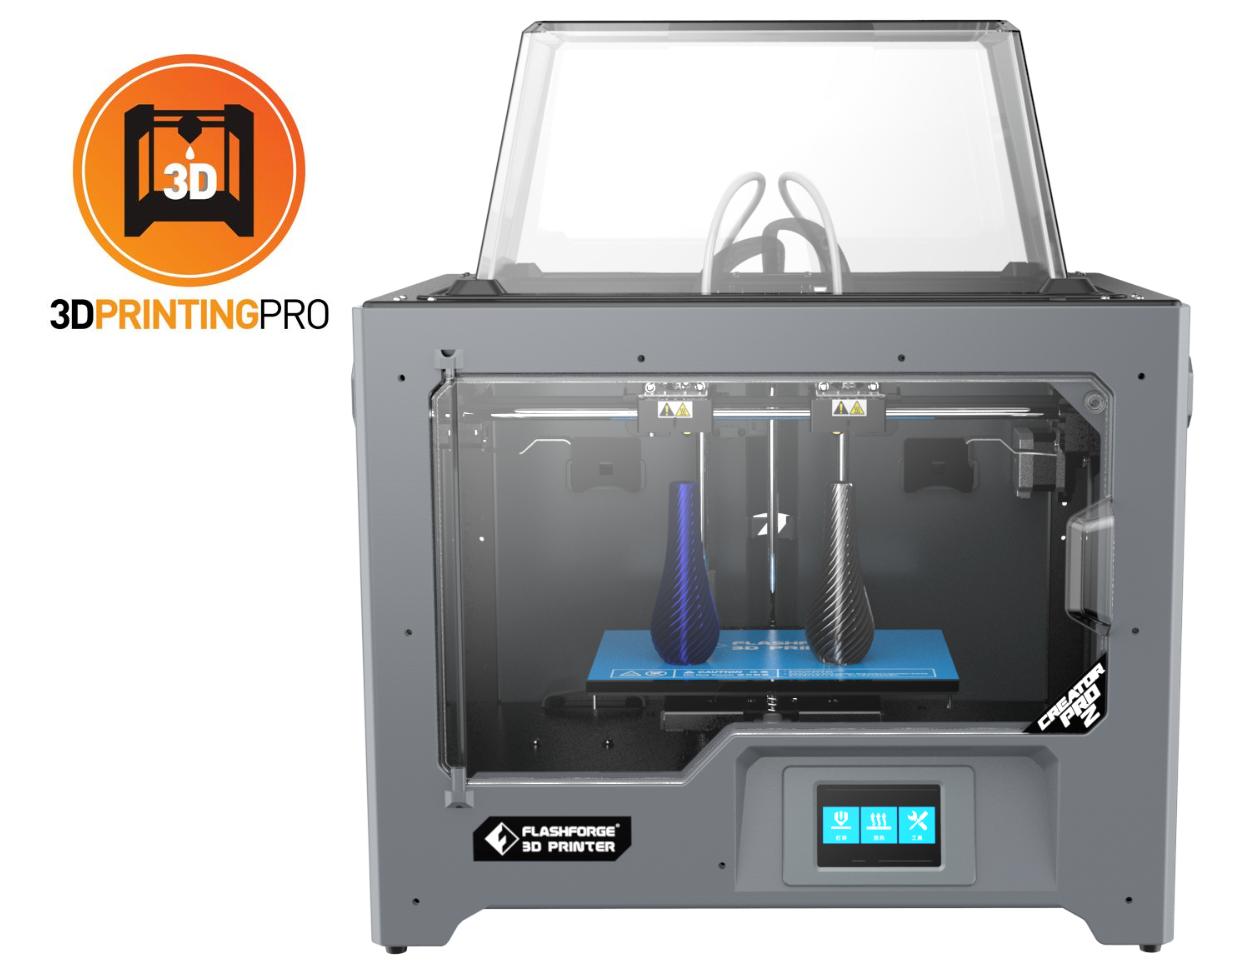 Flashforge Creator Pro 2 3D Printer - Independent Dual Extruder (IDEX)